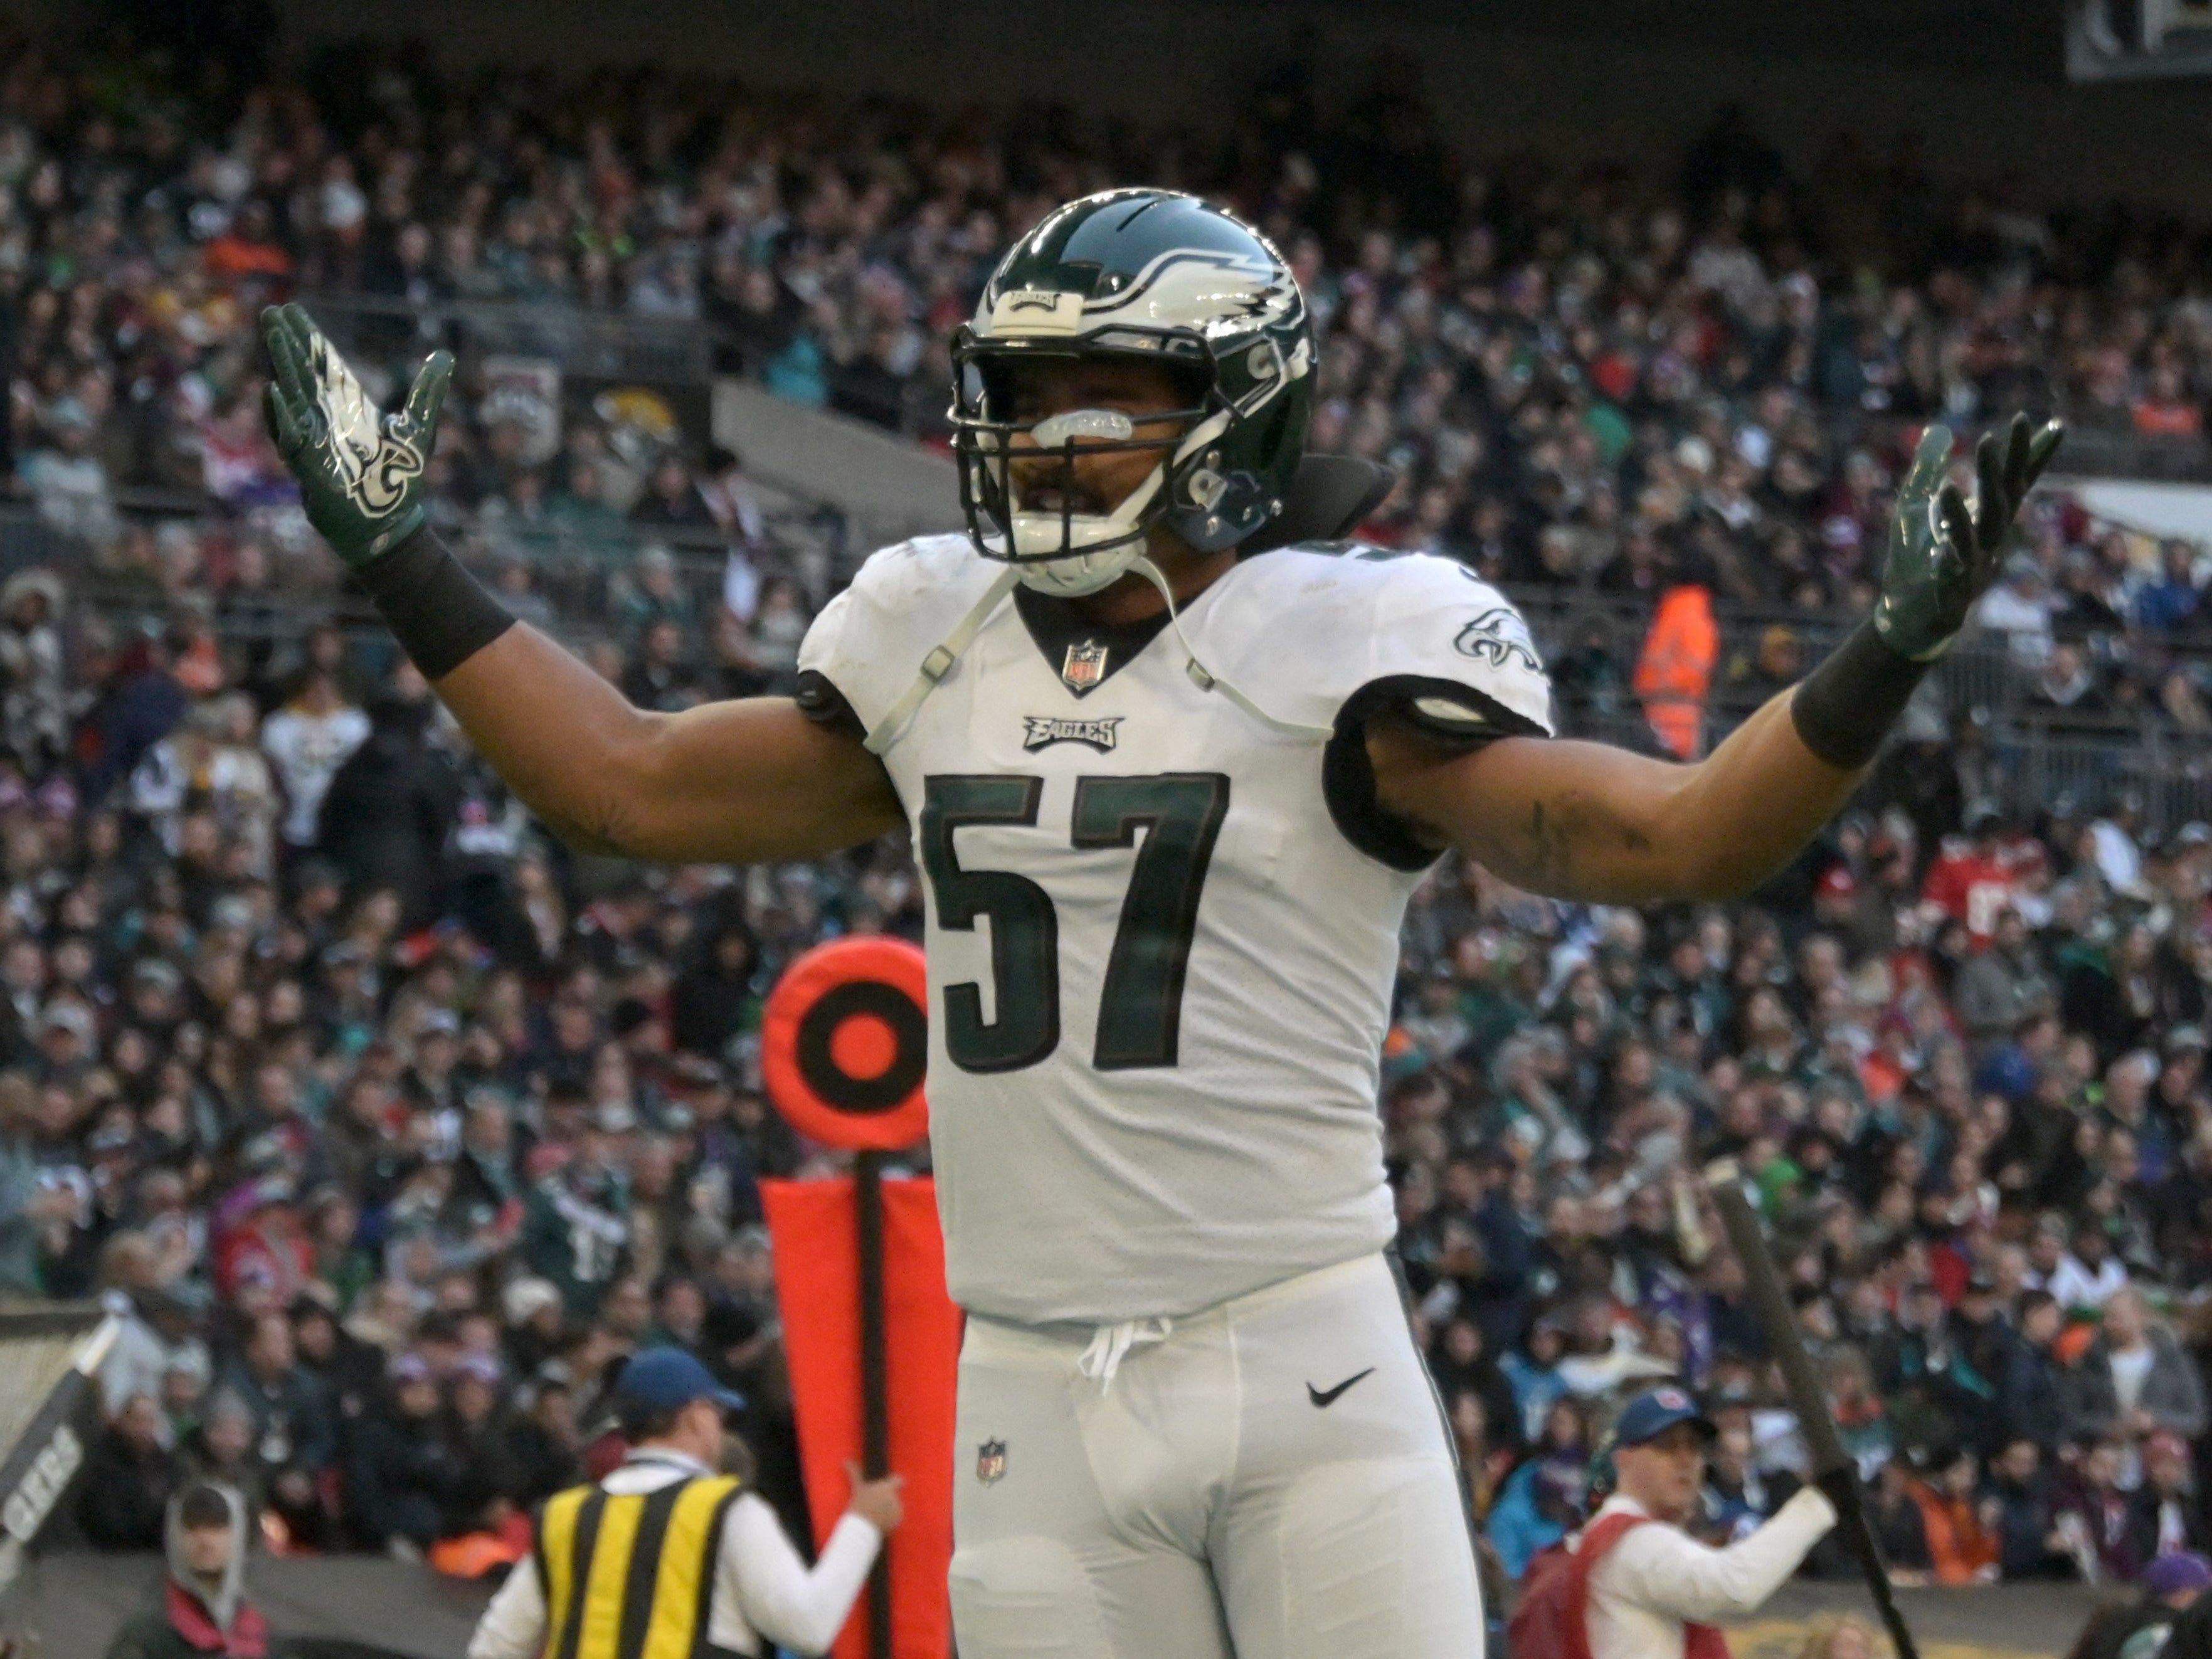 Linebacker D.J. Alexander (57) celebrates during the Philadelphia Eagles' victory against the Jacksonville Jaguars at Wembley Stadium.